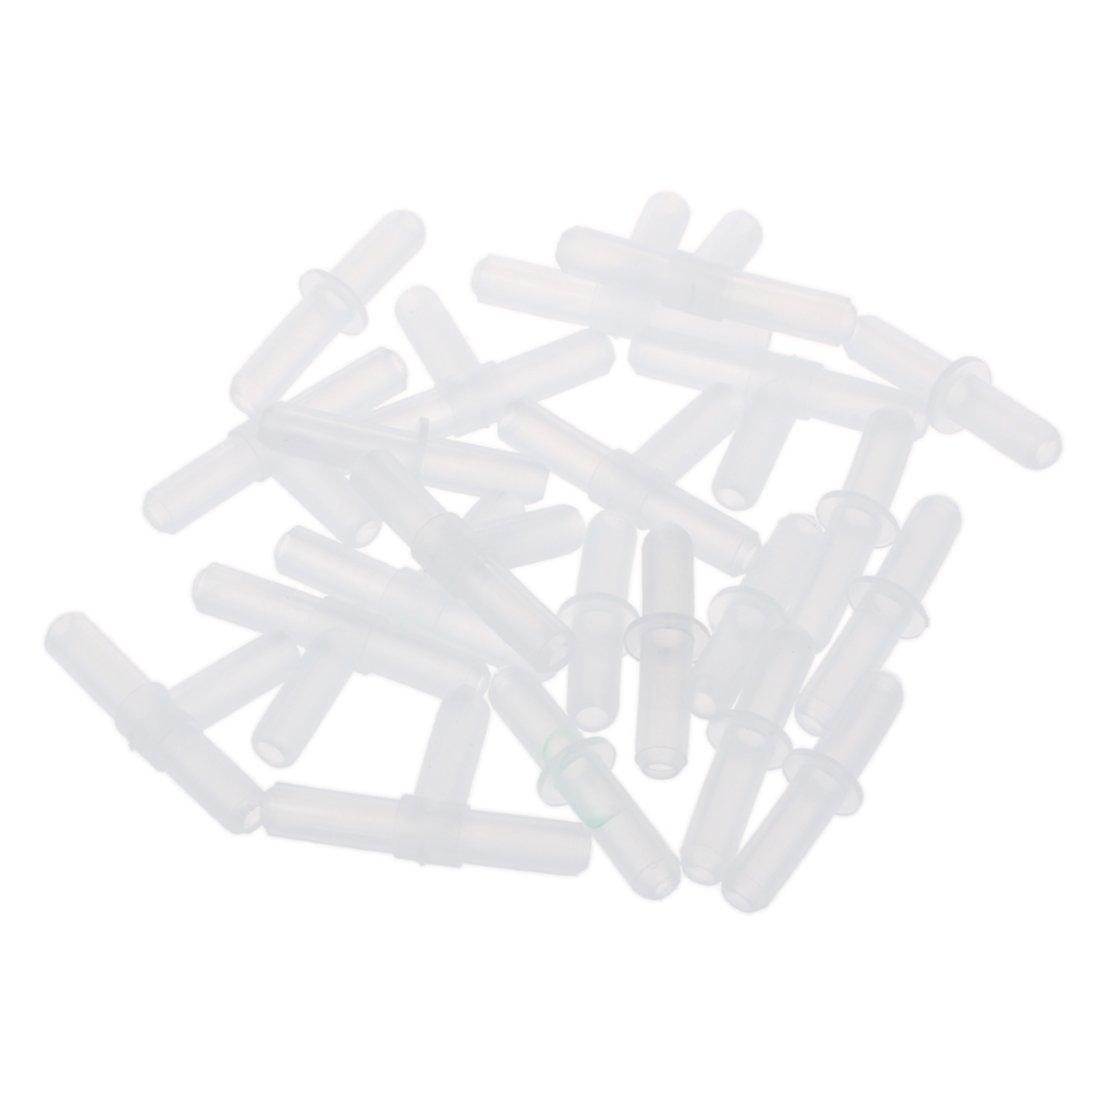 SODIAL 10 pcs T shaped 10 pieces Straight Aquarium flight tube filter adapter